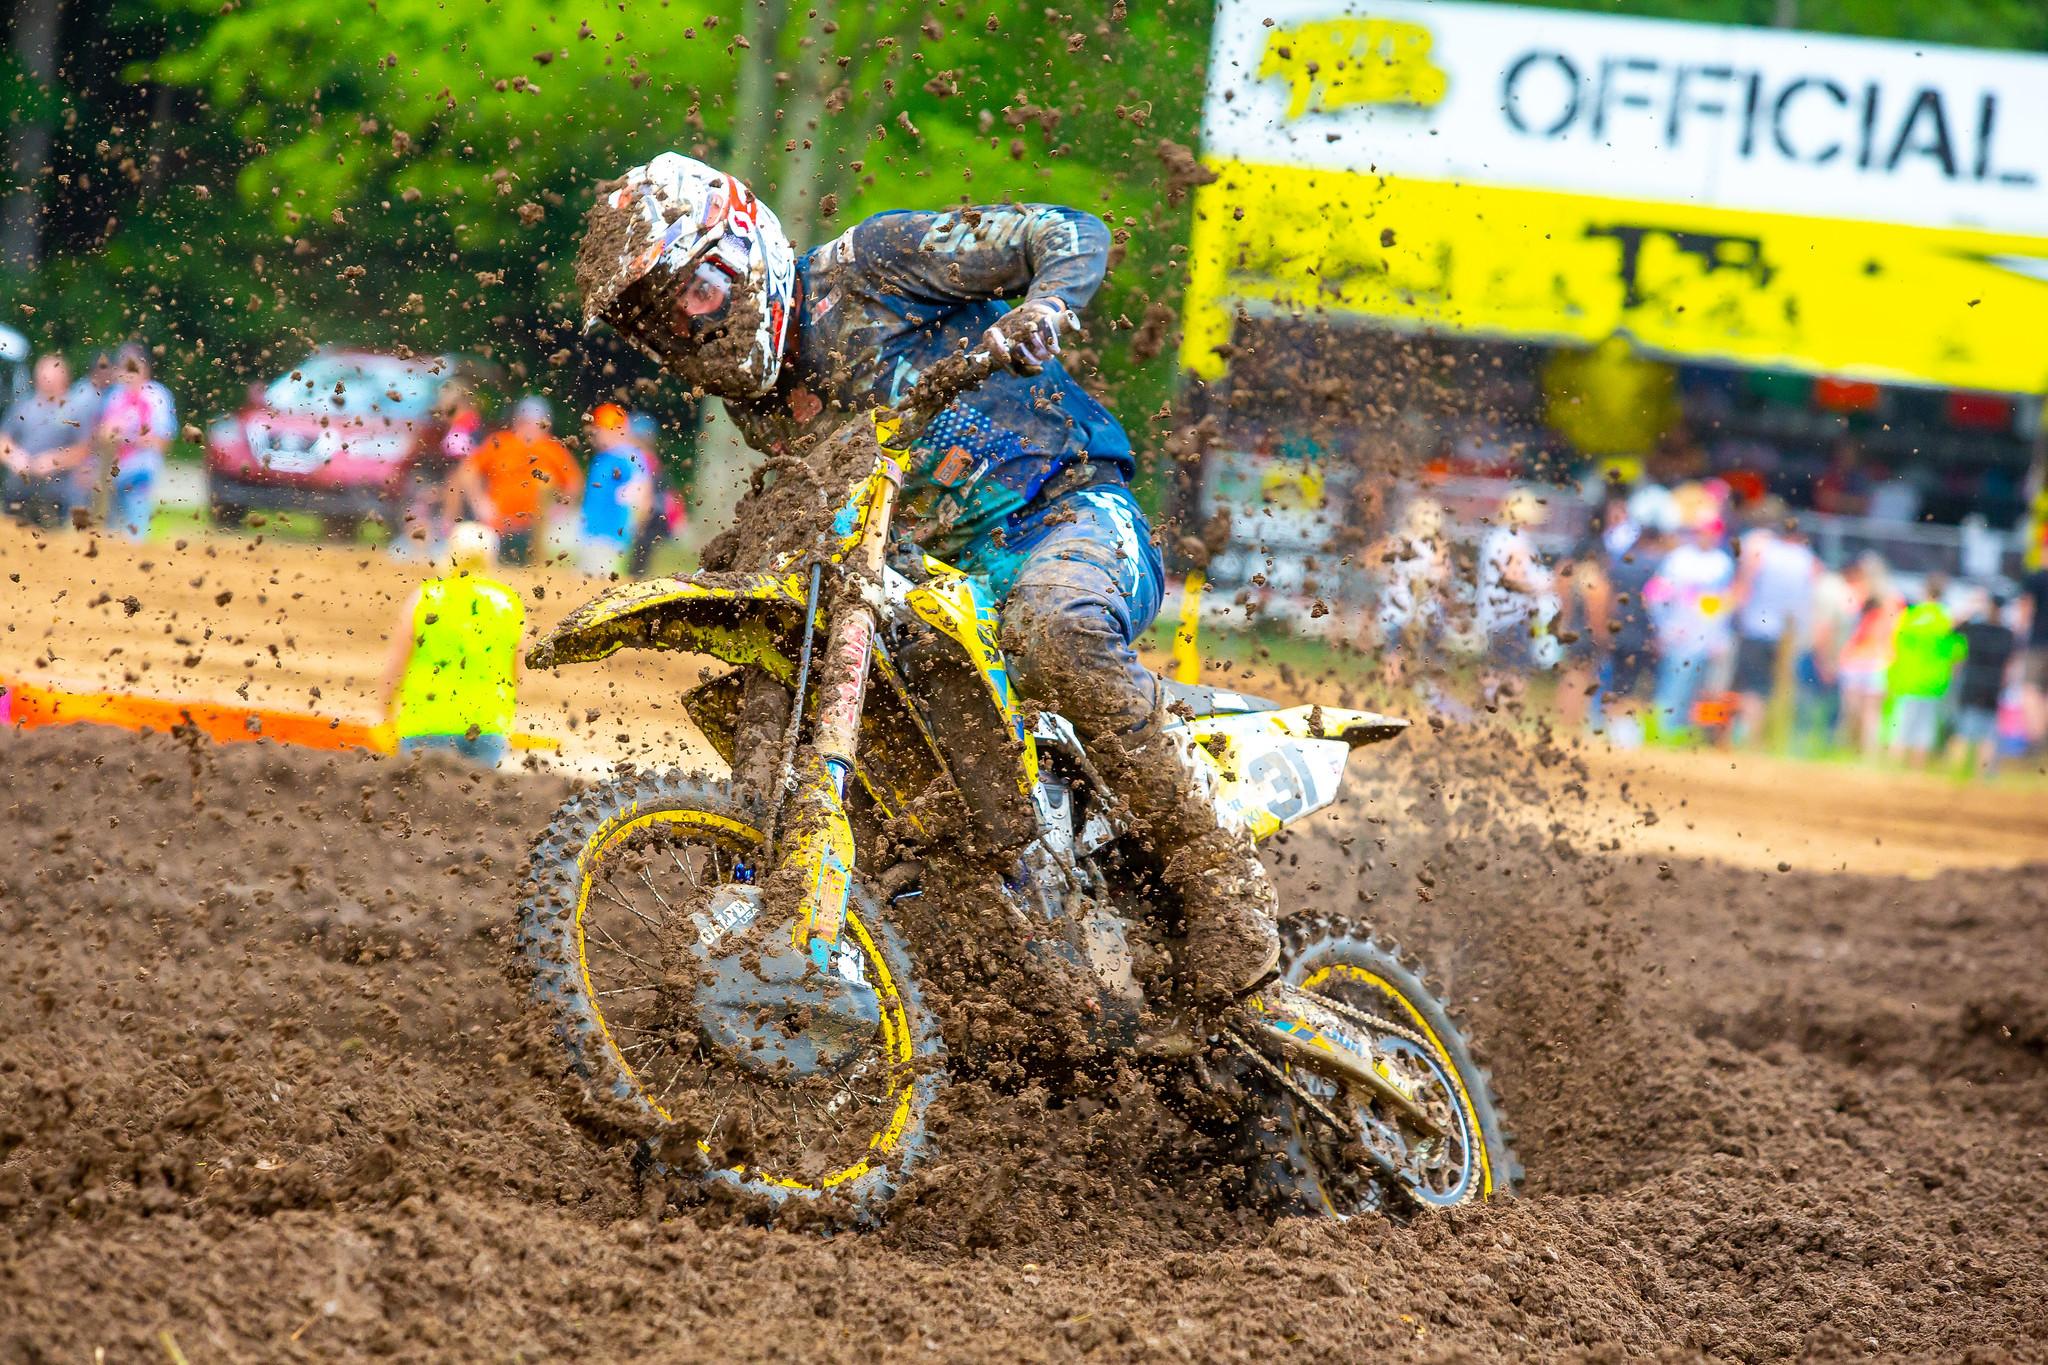 200817 Fredrik Noren (31) had two solid rides on his Suzuki RM-Z450